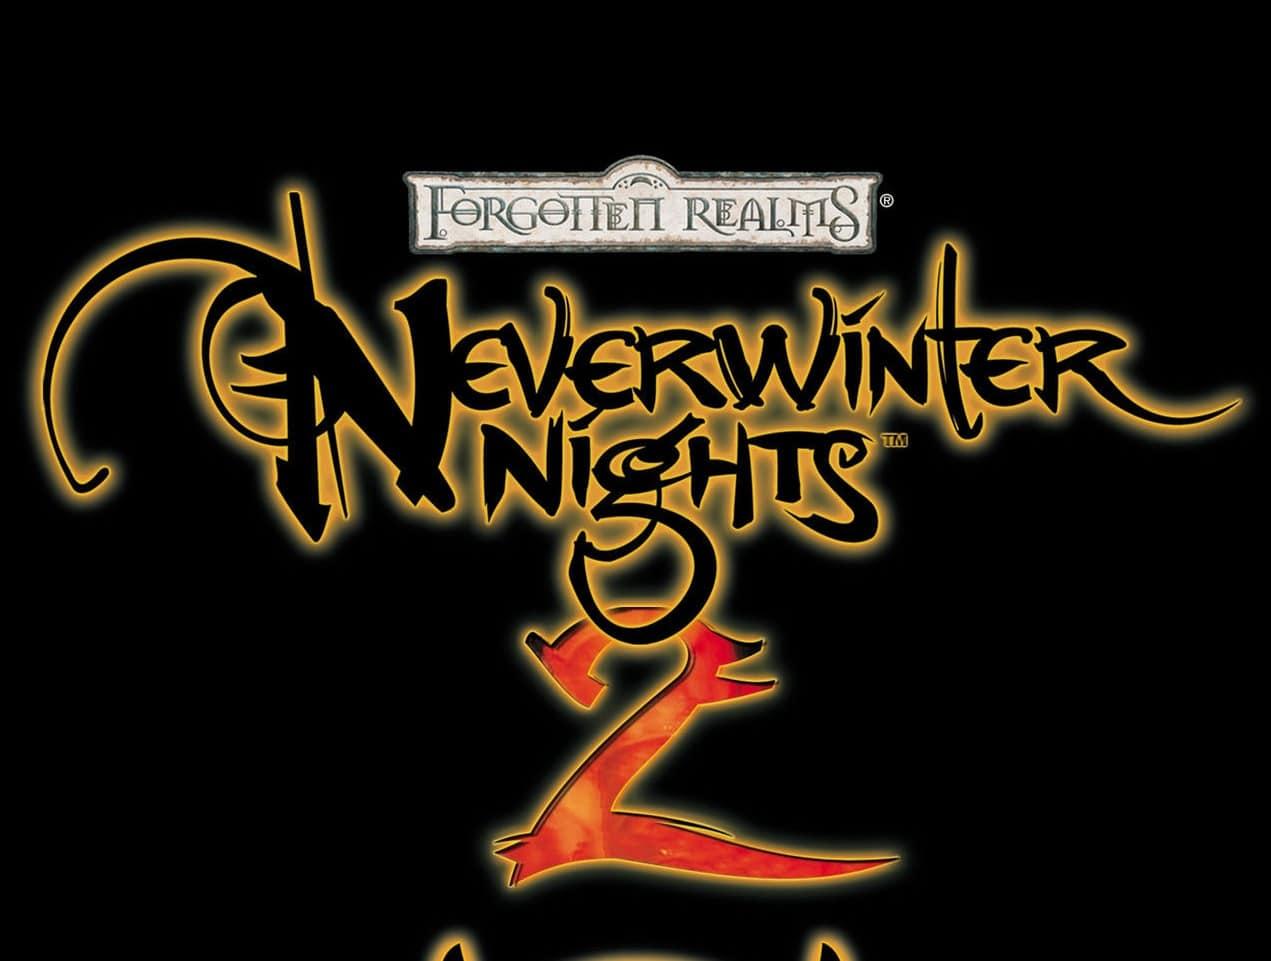 comandos de Neverwinter Nights II